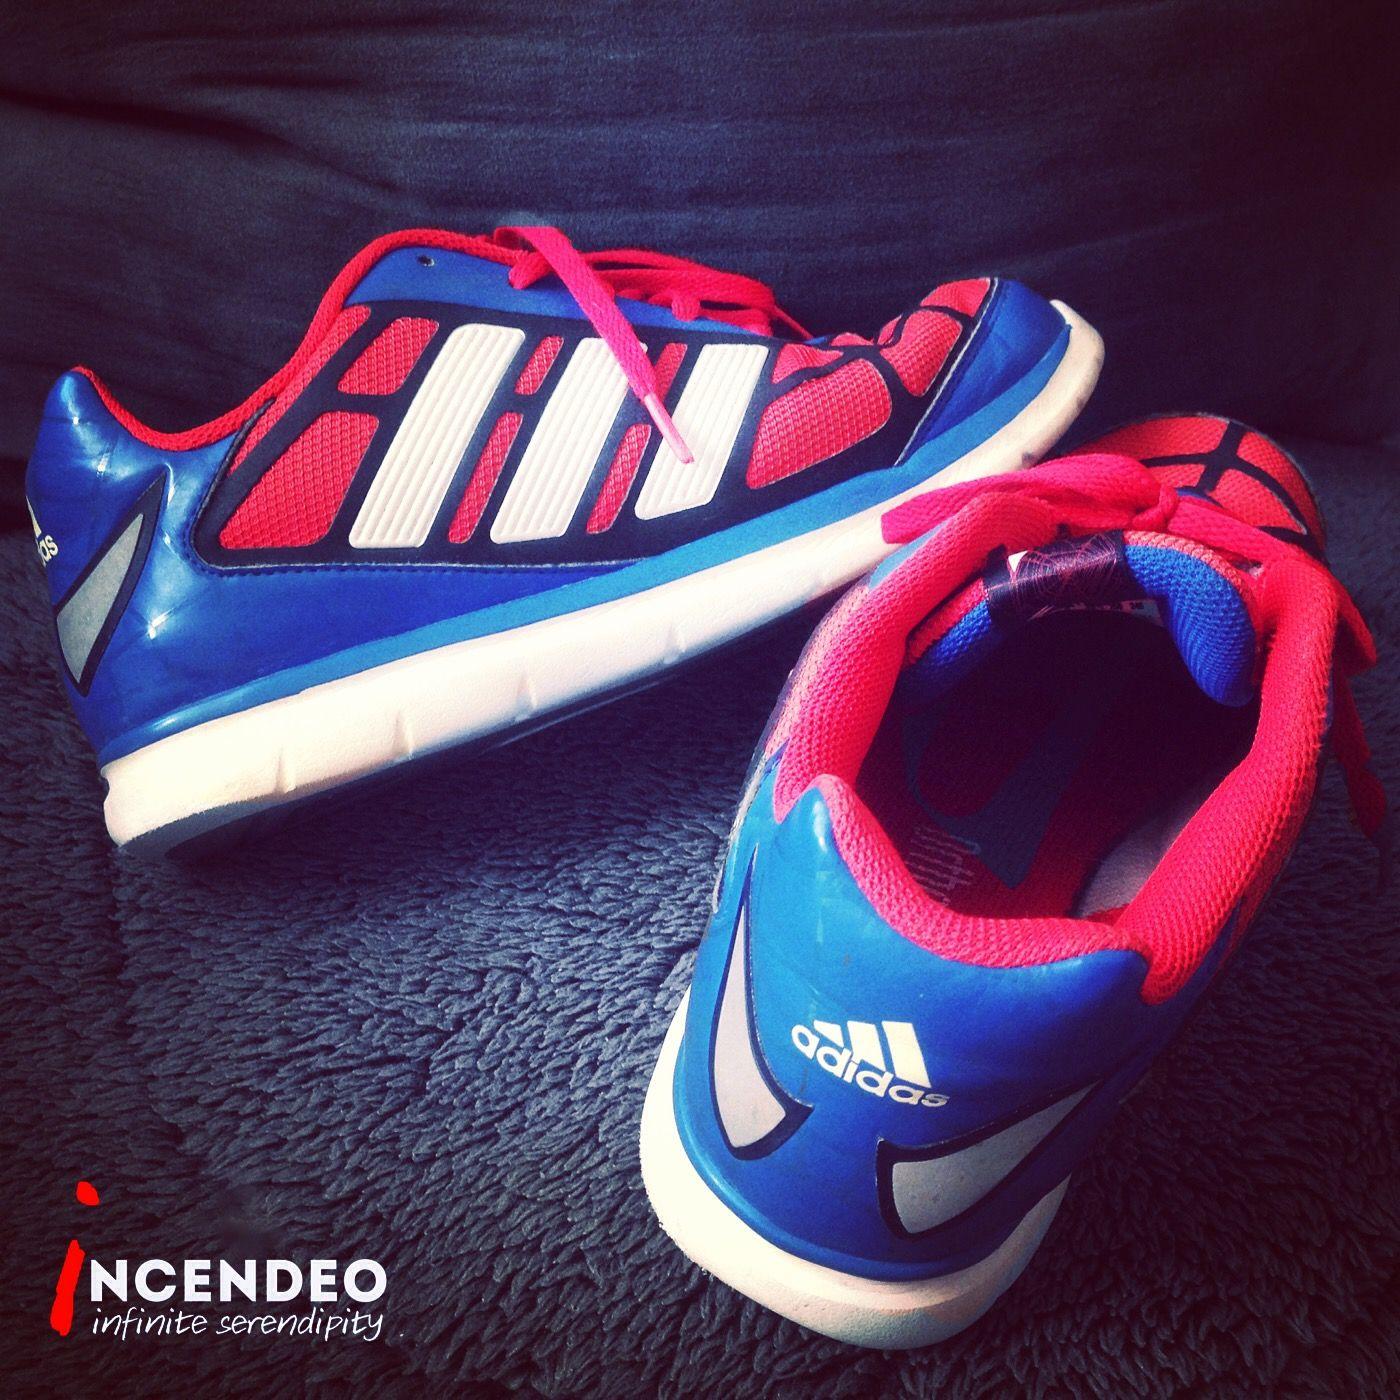 addidas Spiderman Shoes. #adidas #spiderman #disney #marvel